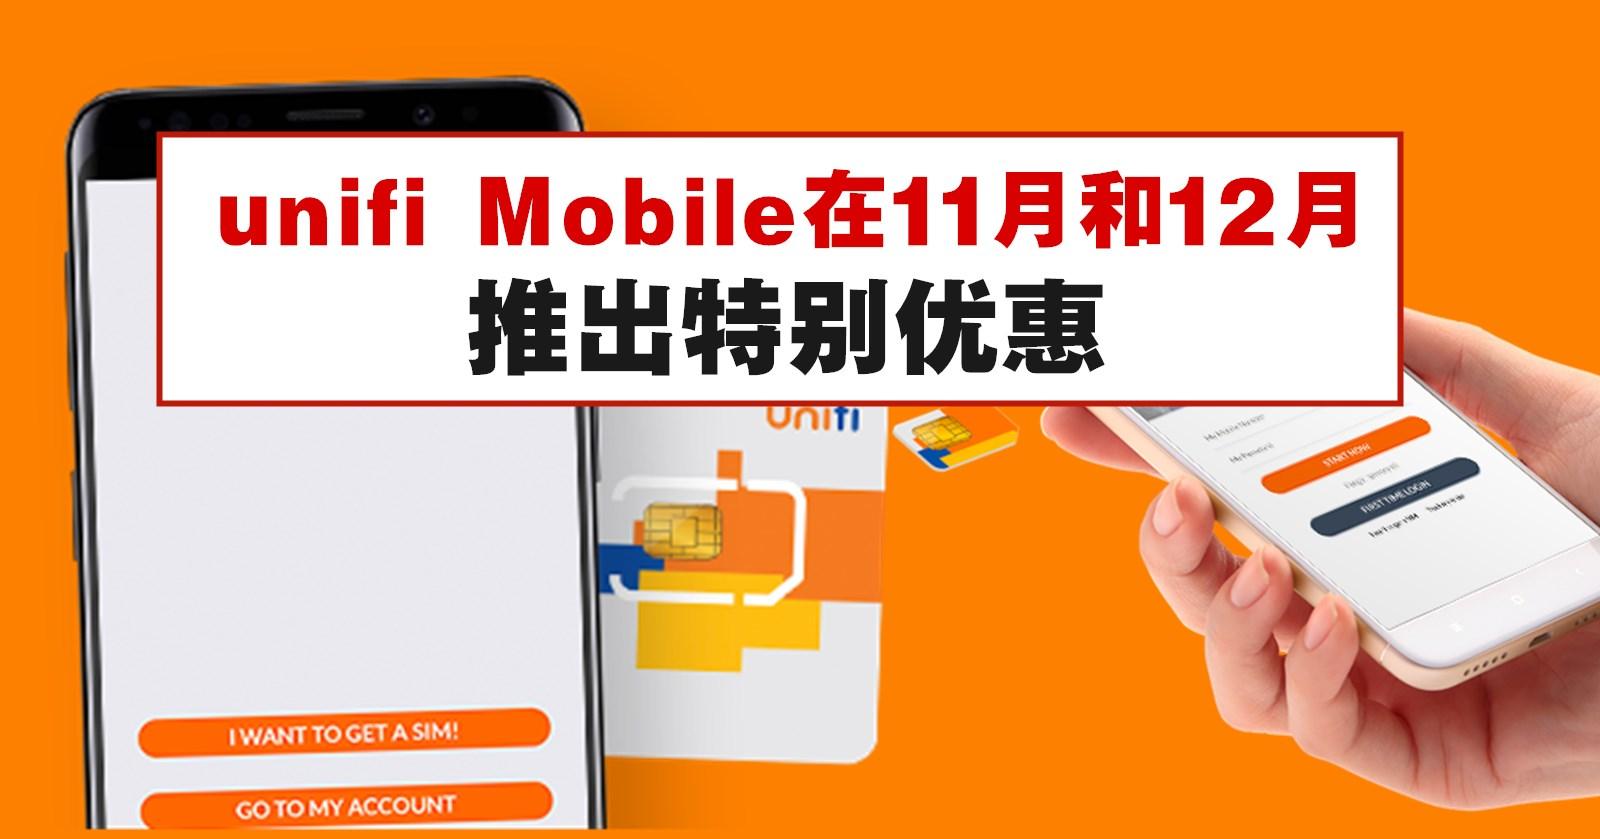 unifi Mobile在11月和12月推出特别优惠